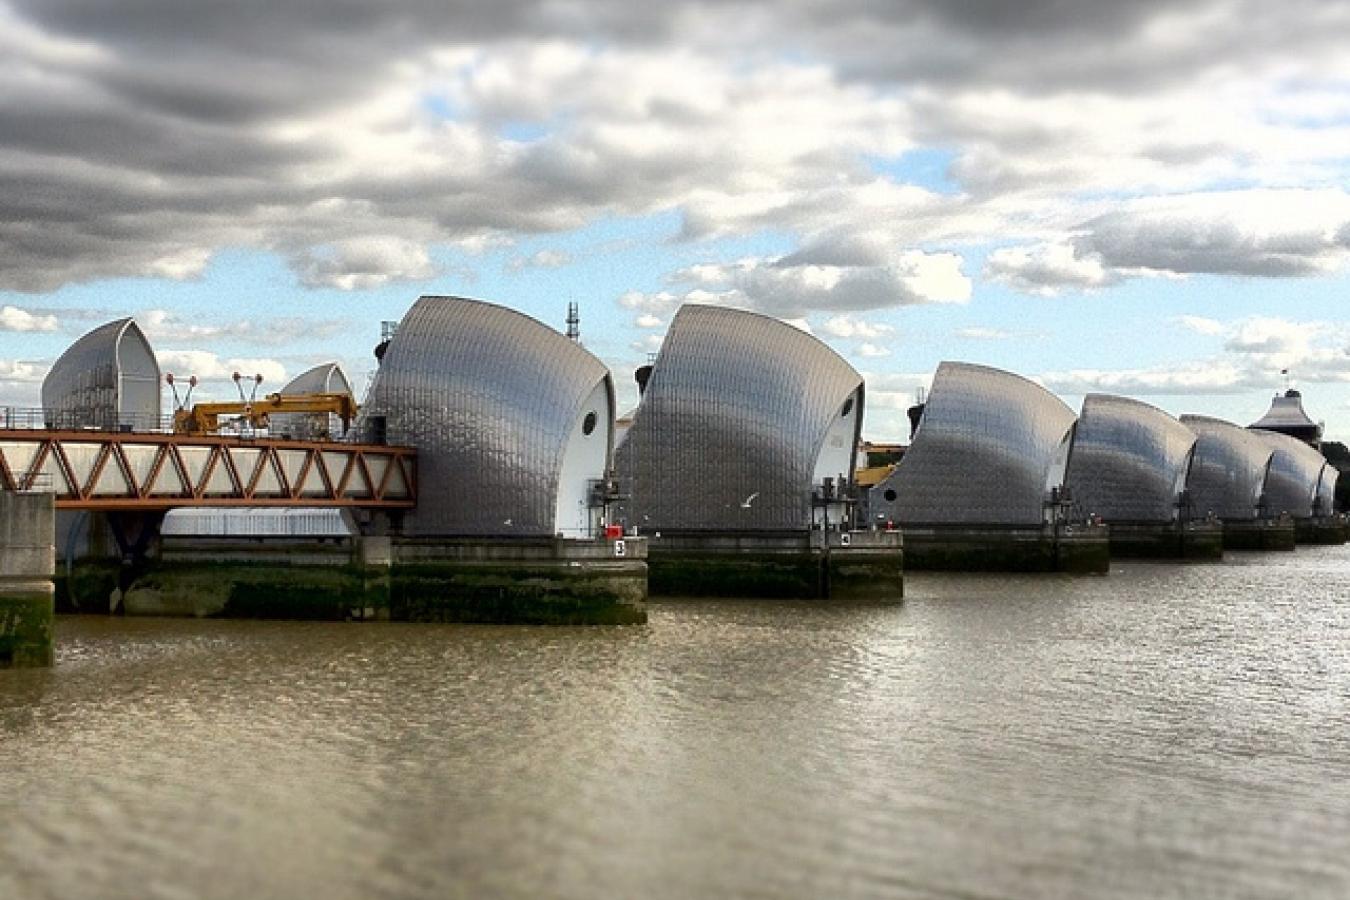 Thames Barrier, Newham, London, UK